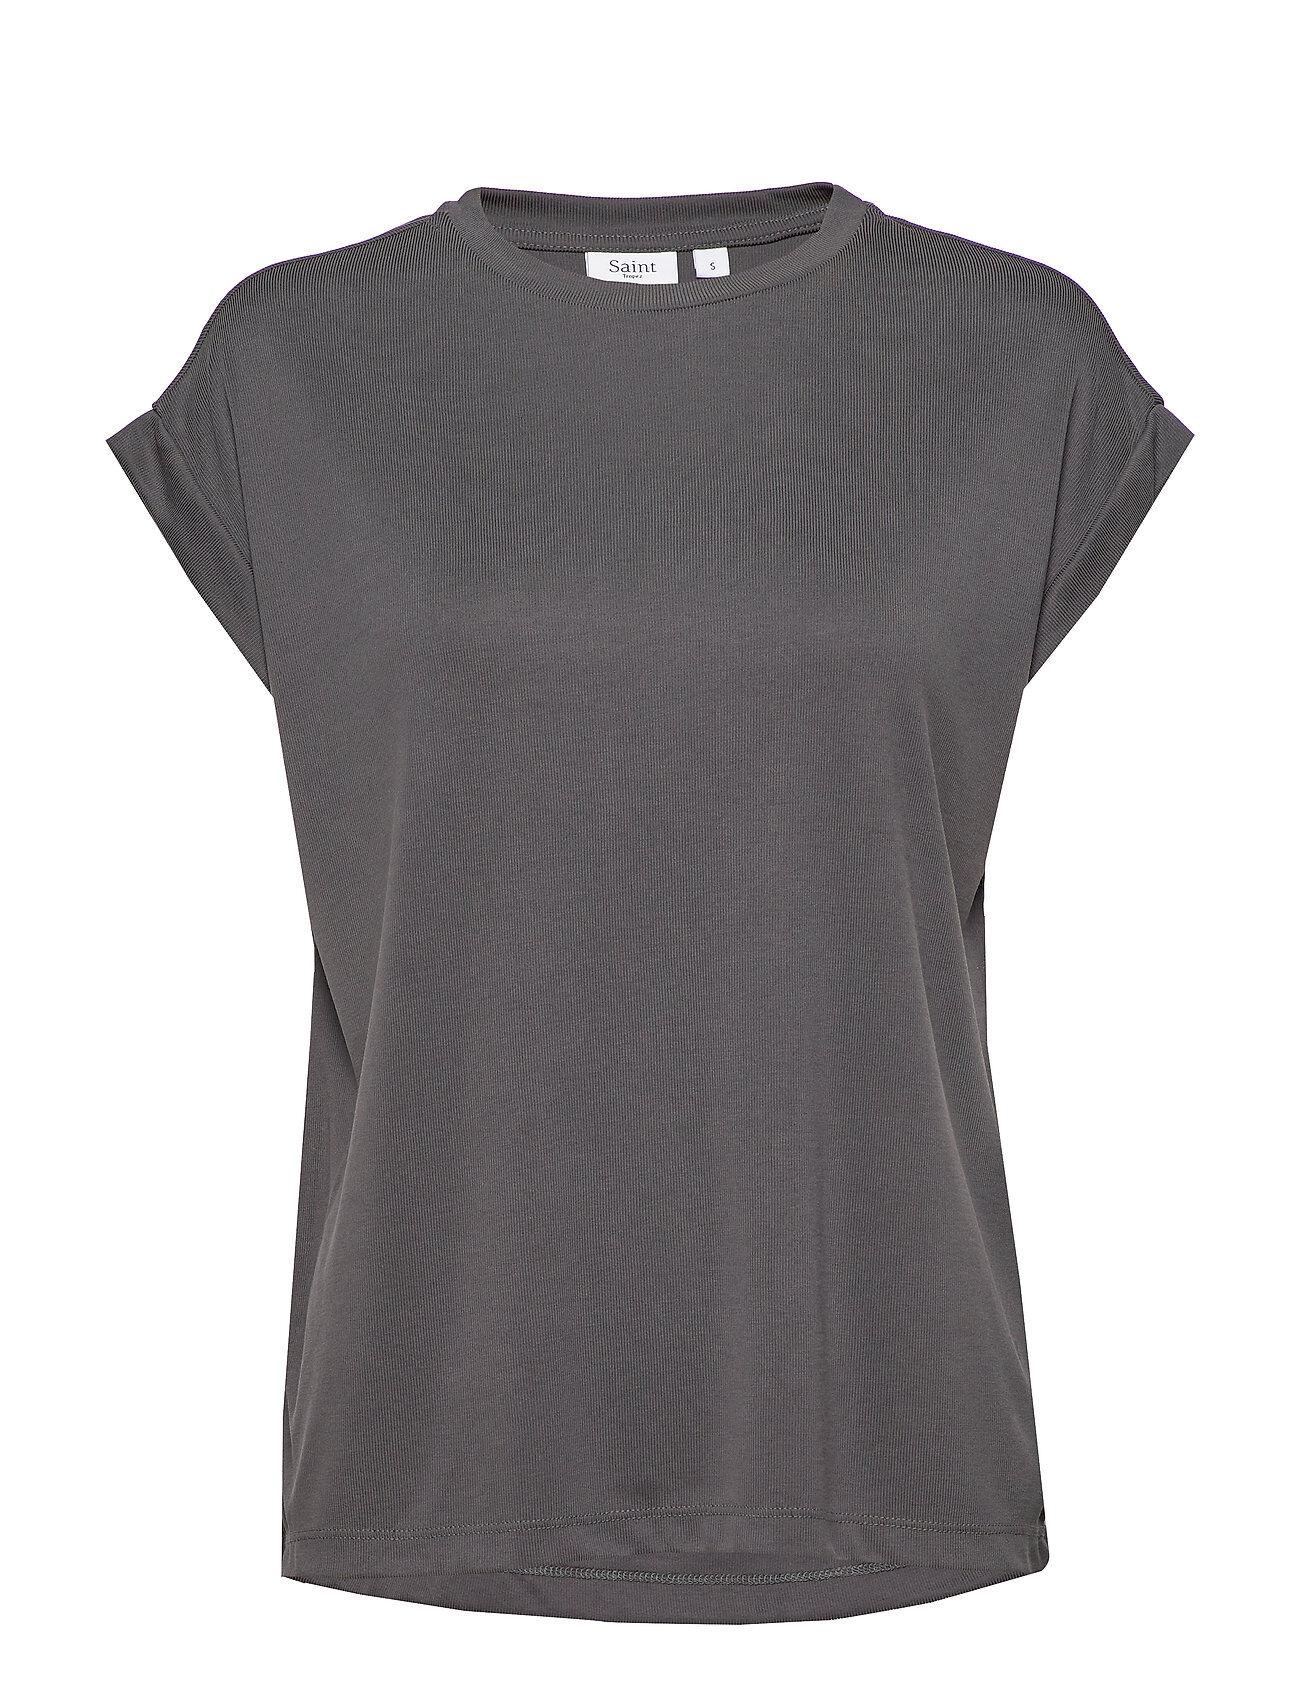 Saint Tropez Giasz Jersey Top T-shirts & Tops Short-sleeved Musta Saint Tropez